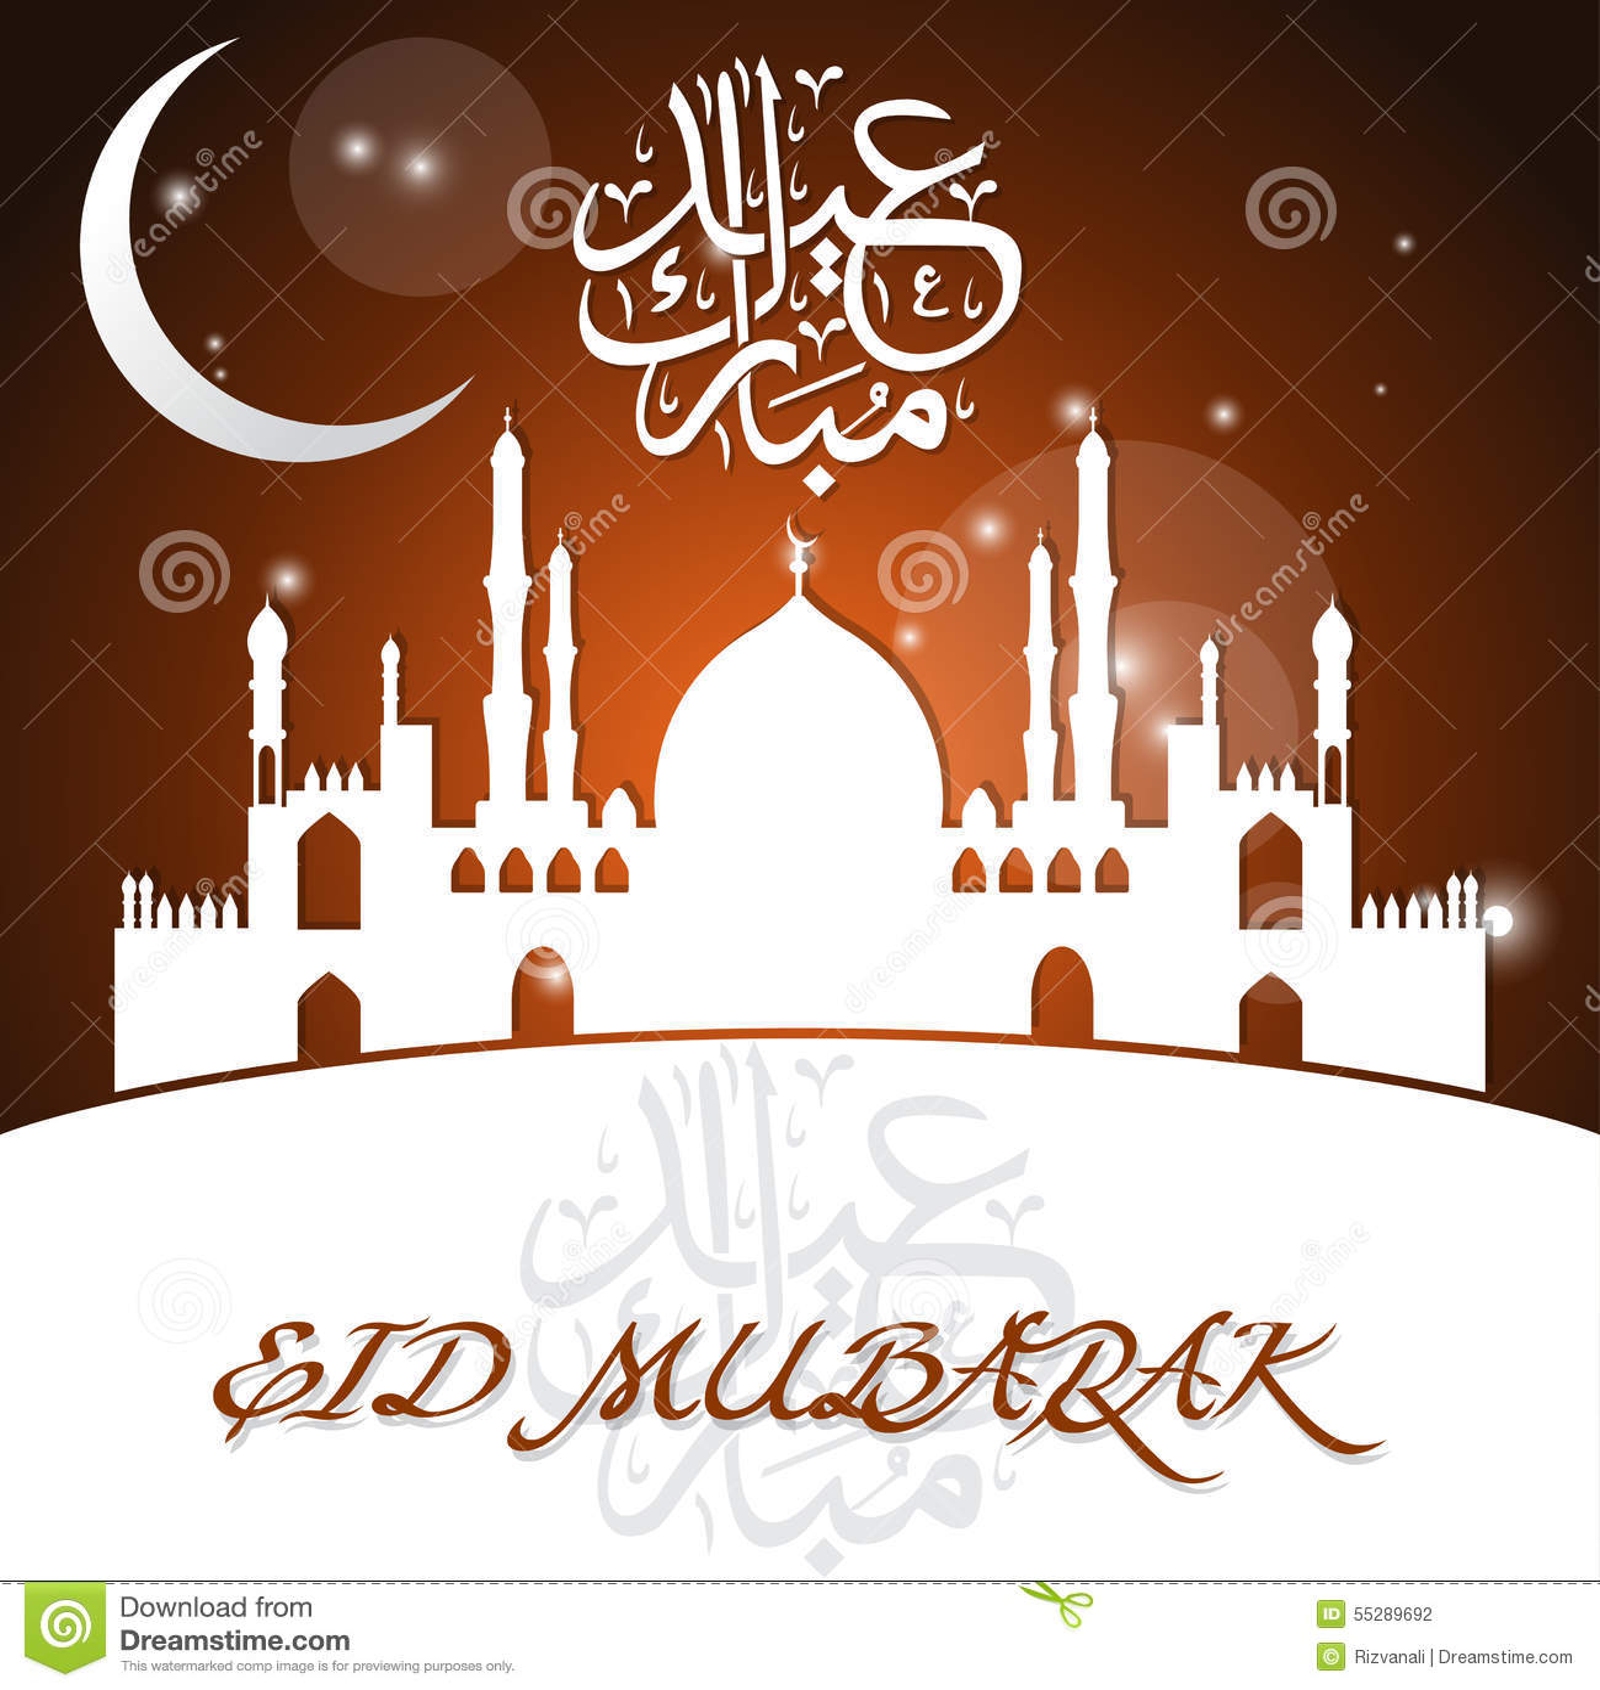 Cool Idd Eid Al-Fitr Greeting - eid-ul-fitr-greeting-card-vector-illustration-55289692  Graphic_861528 .jpg